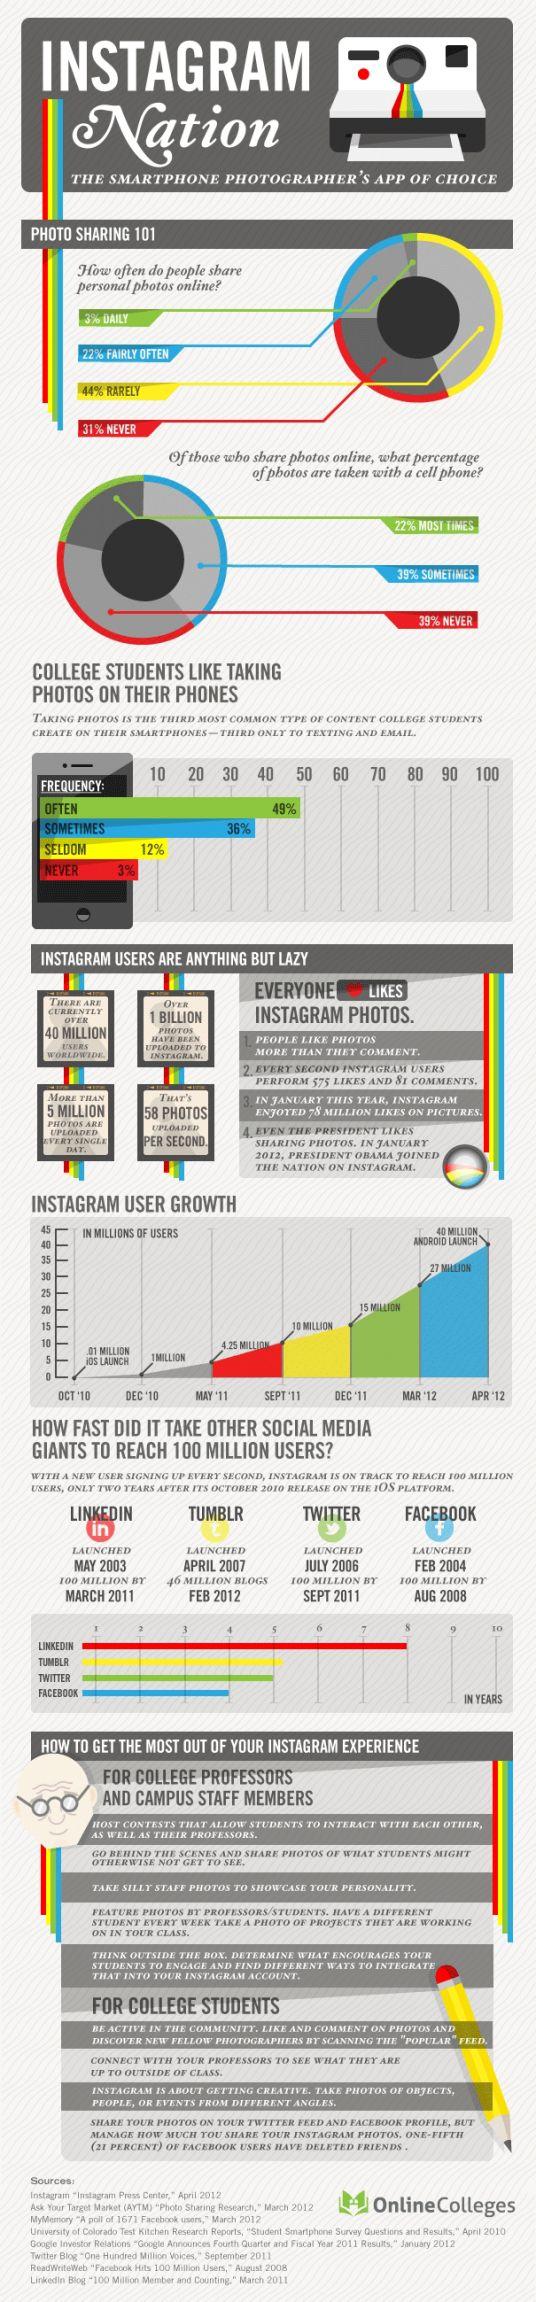 Instagram Nation Infographic